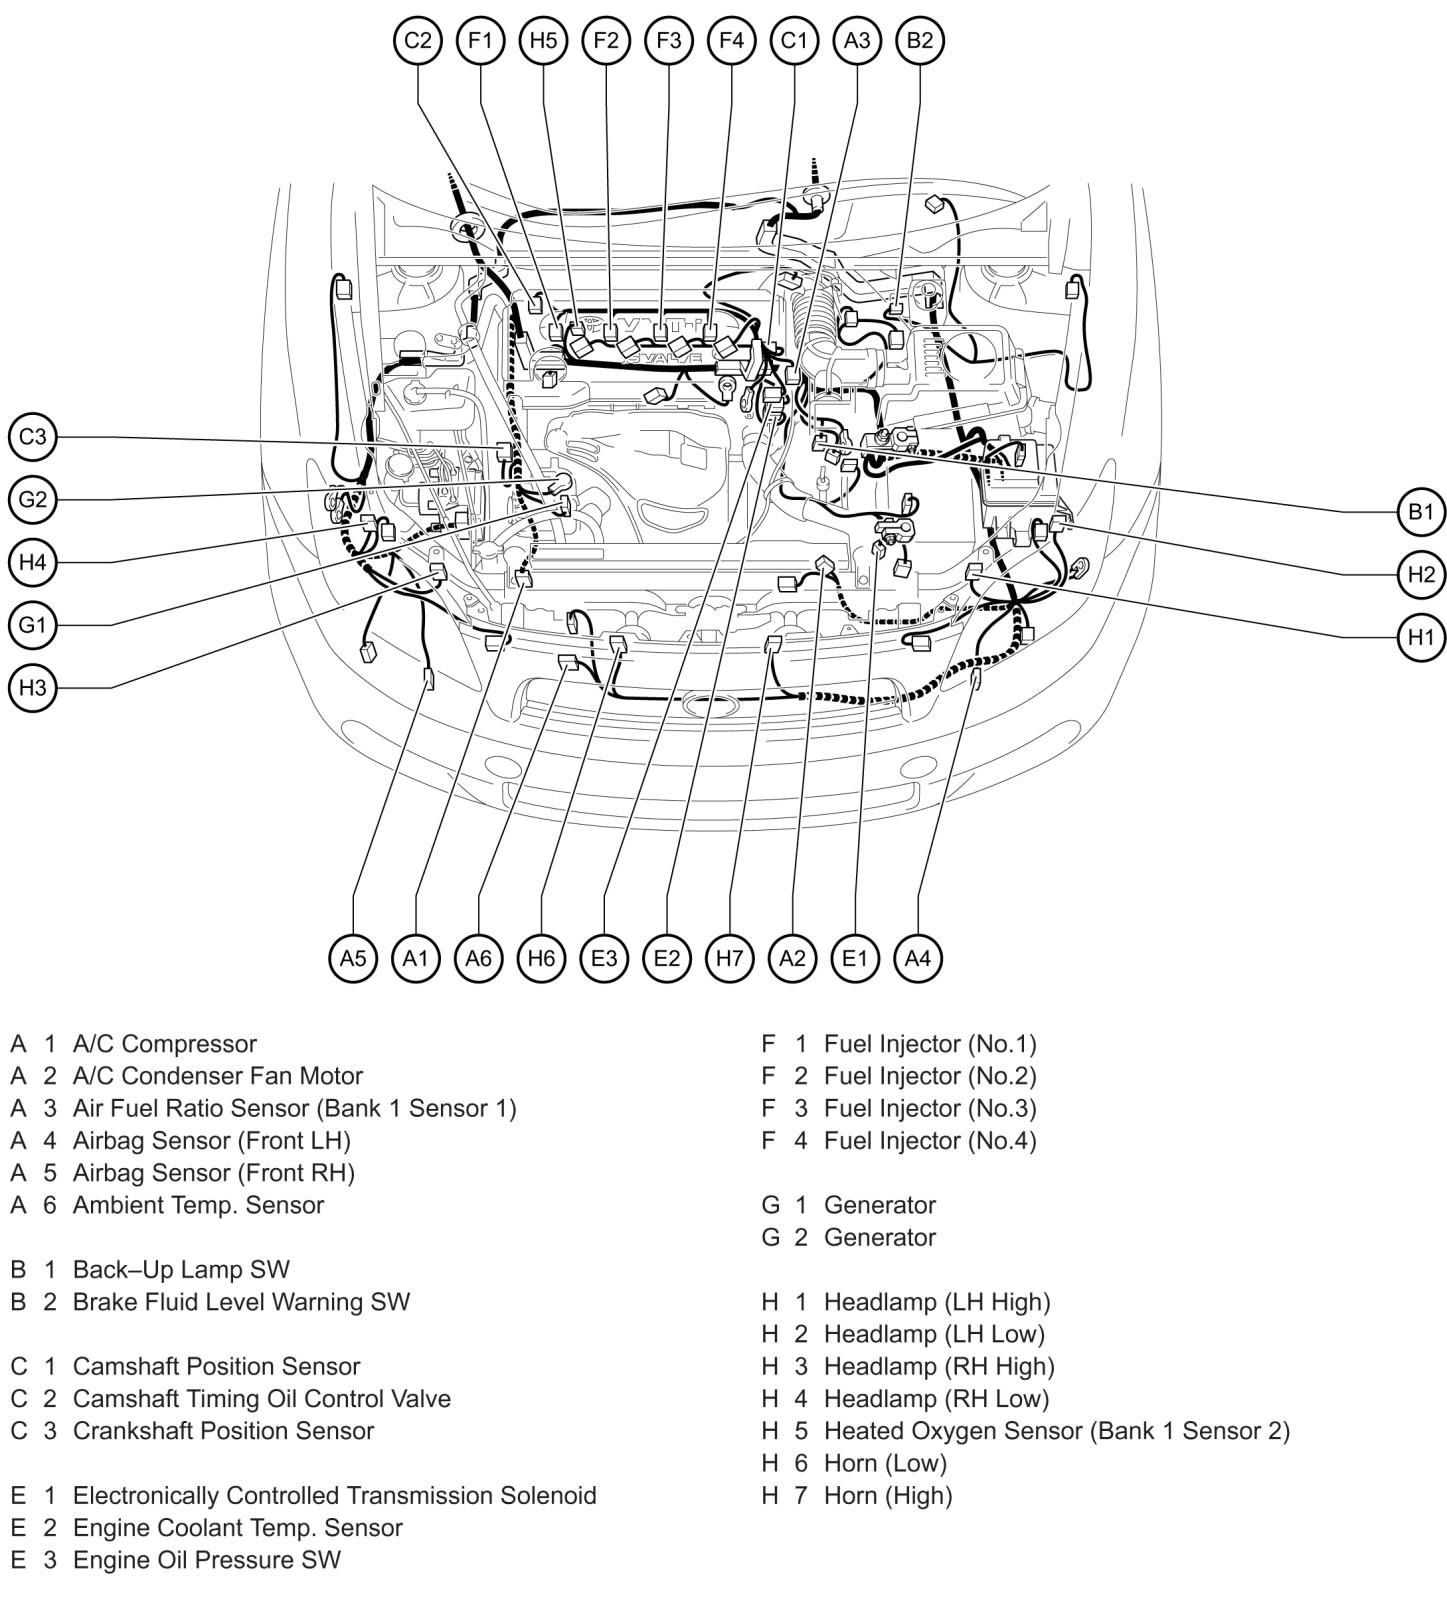 hight resolution of 2006 scion tc alternator wiring best site wiring harness 2006 scion tc fuse diagram scion tc fuse box location